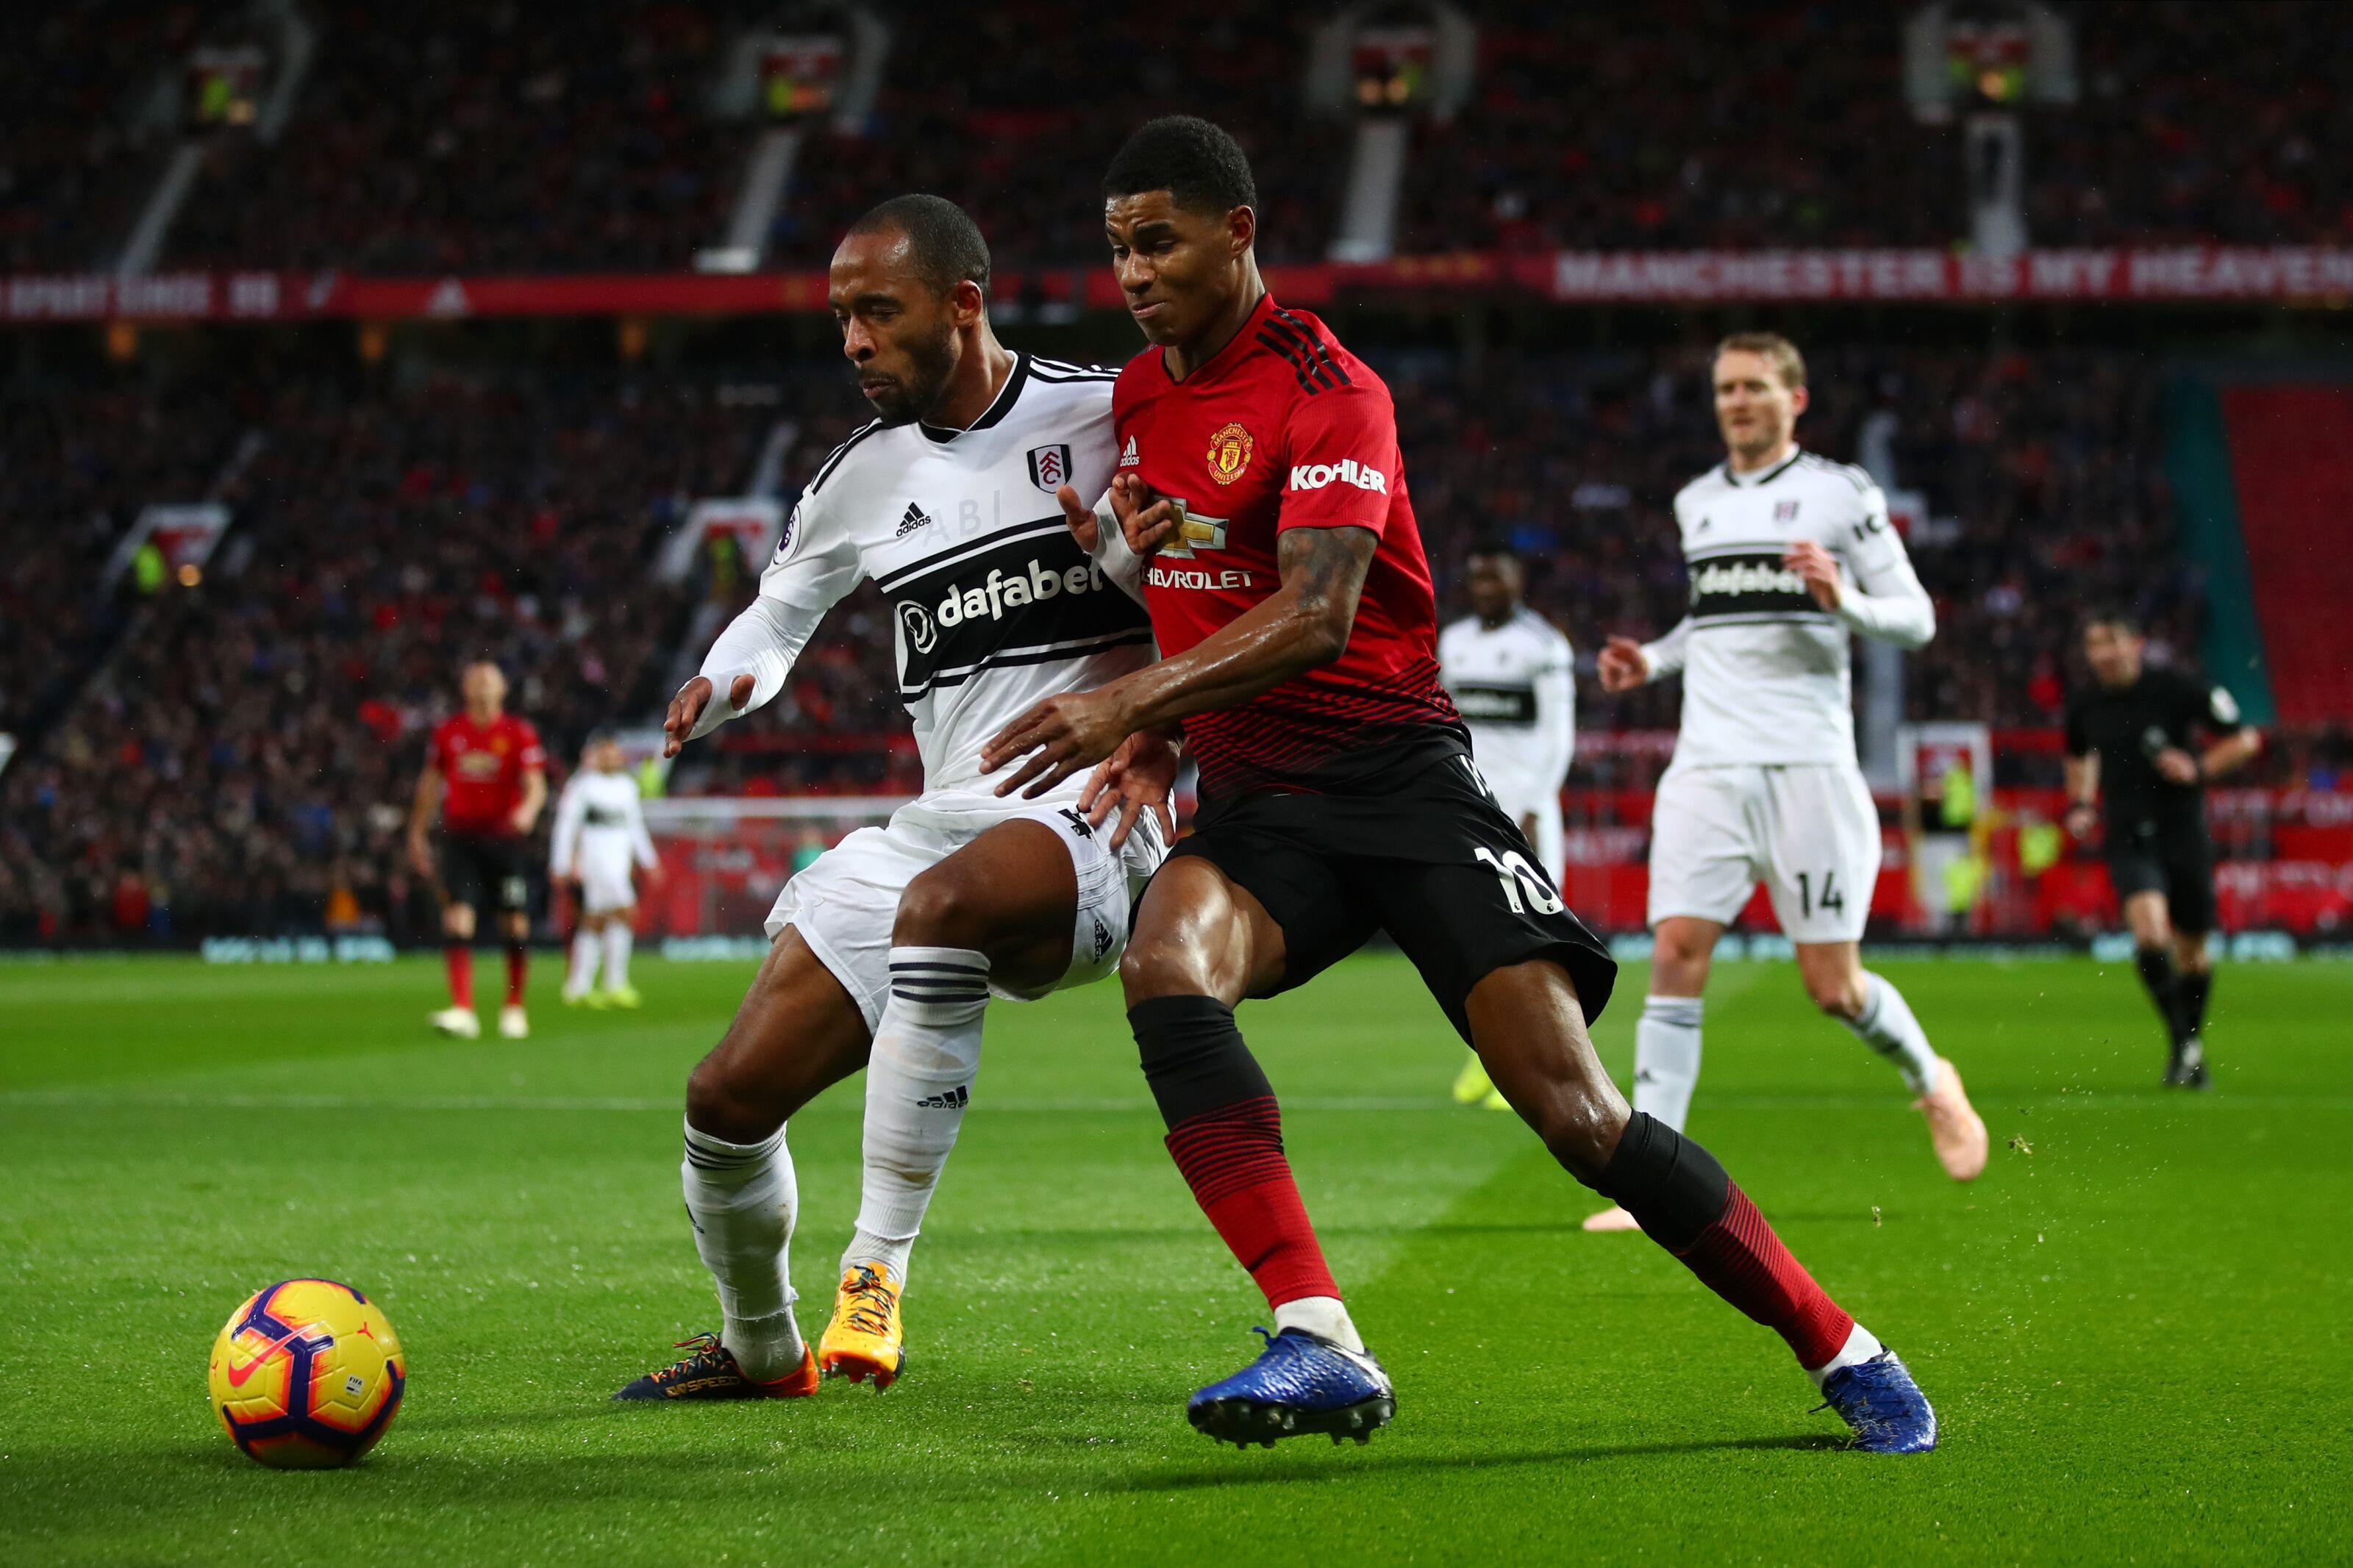 Fulham Vs Man Utd: Marcus Rashford's Phenomenal Game By Numbers Against